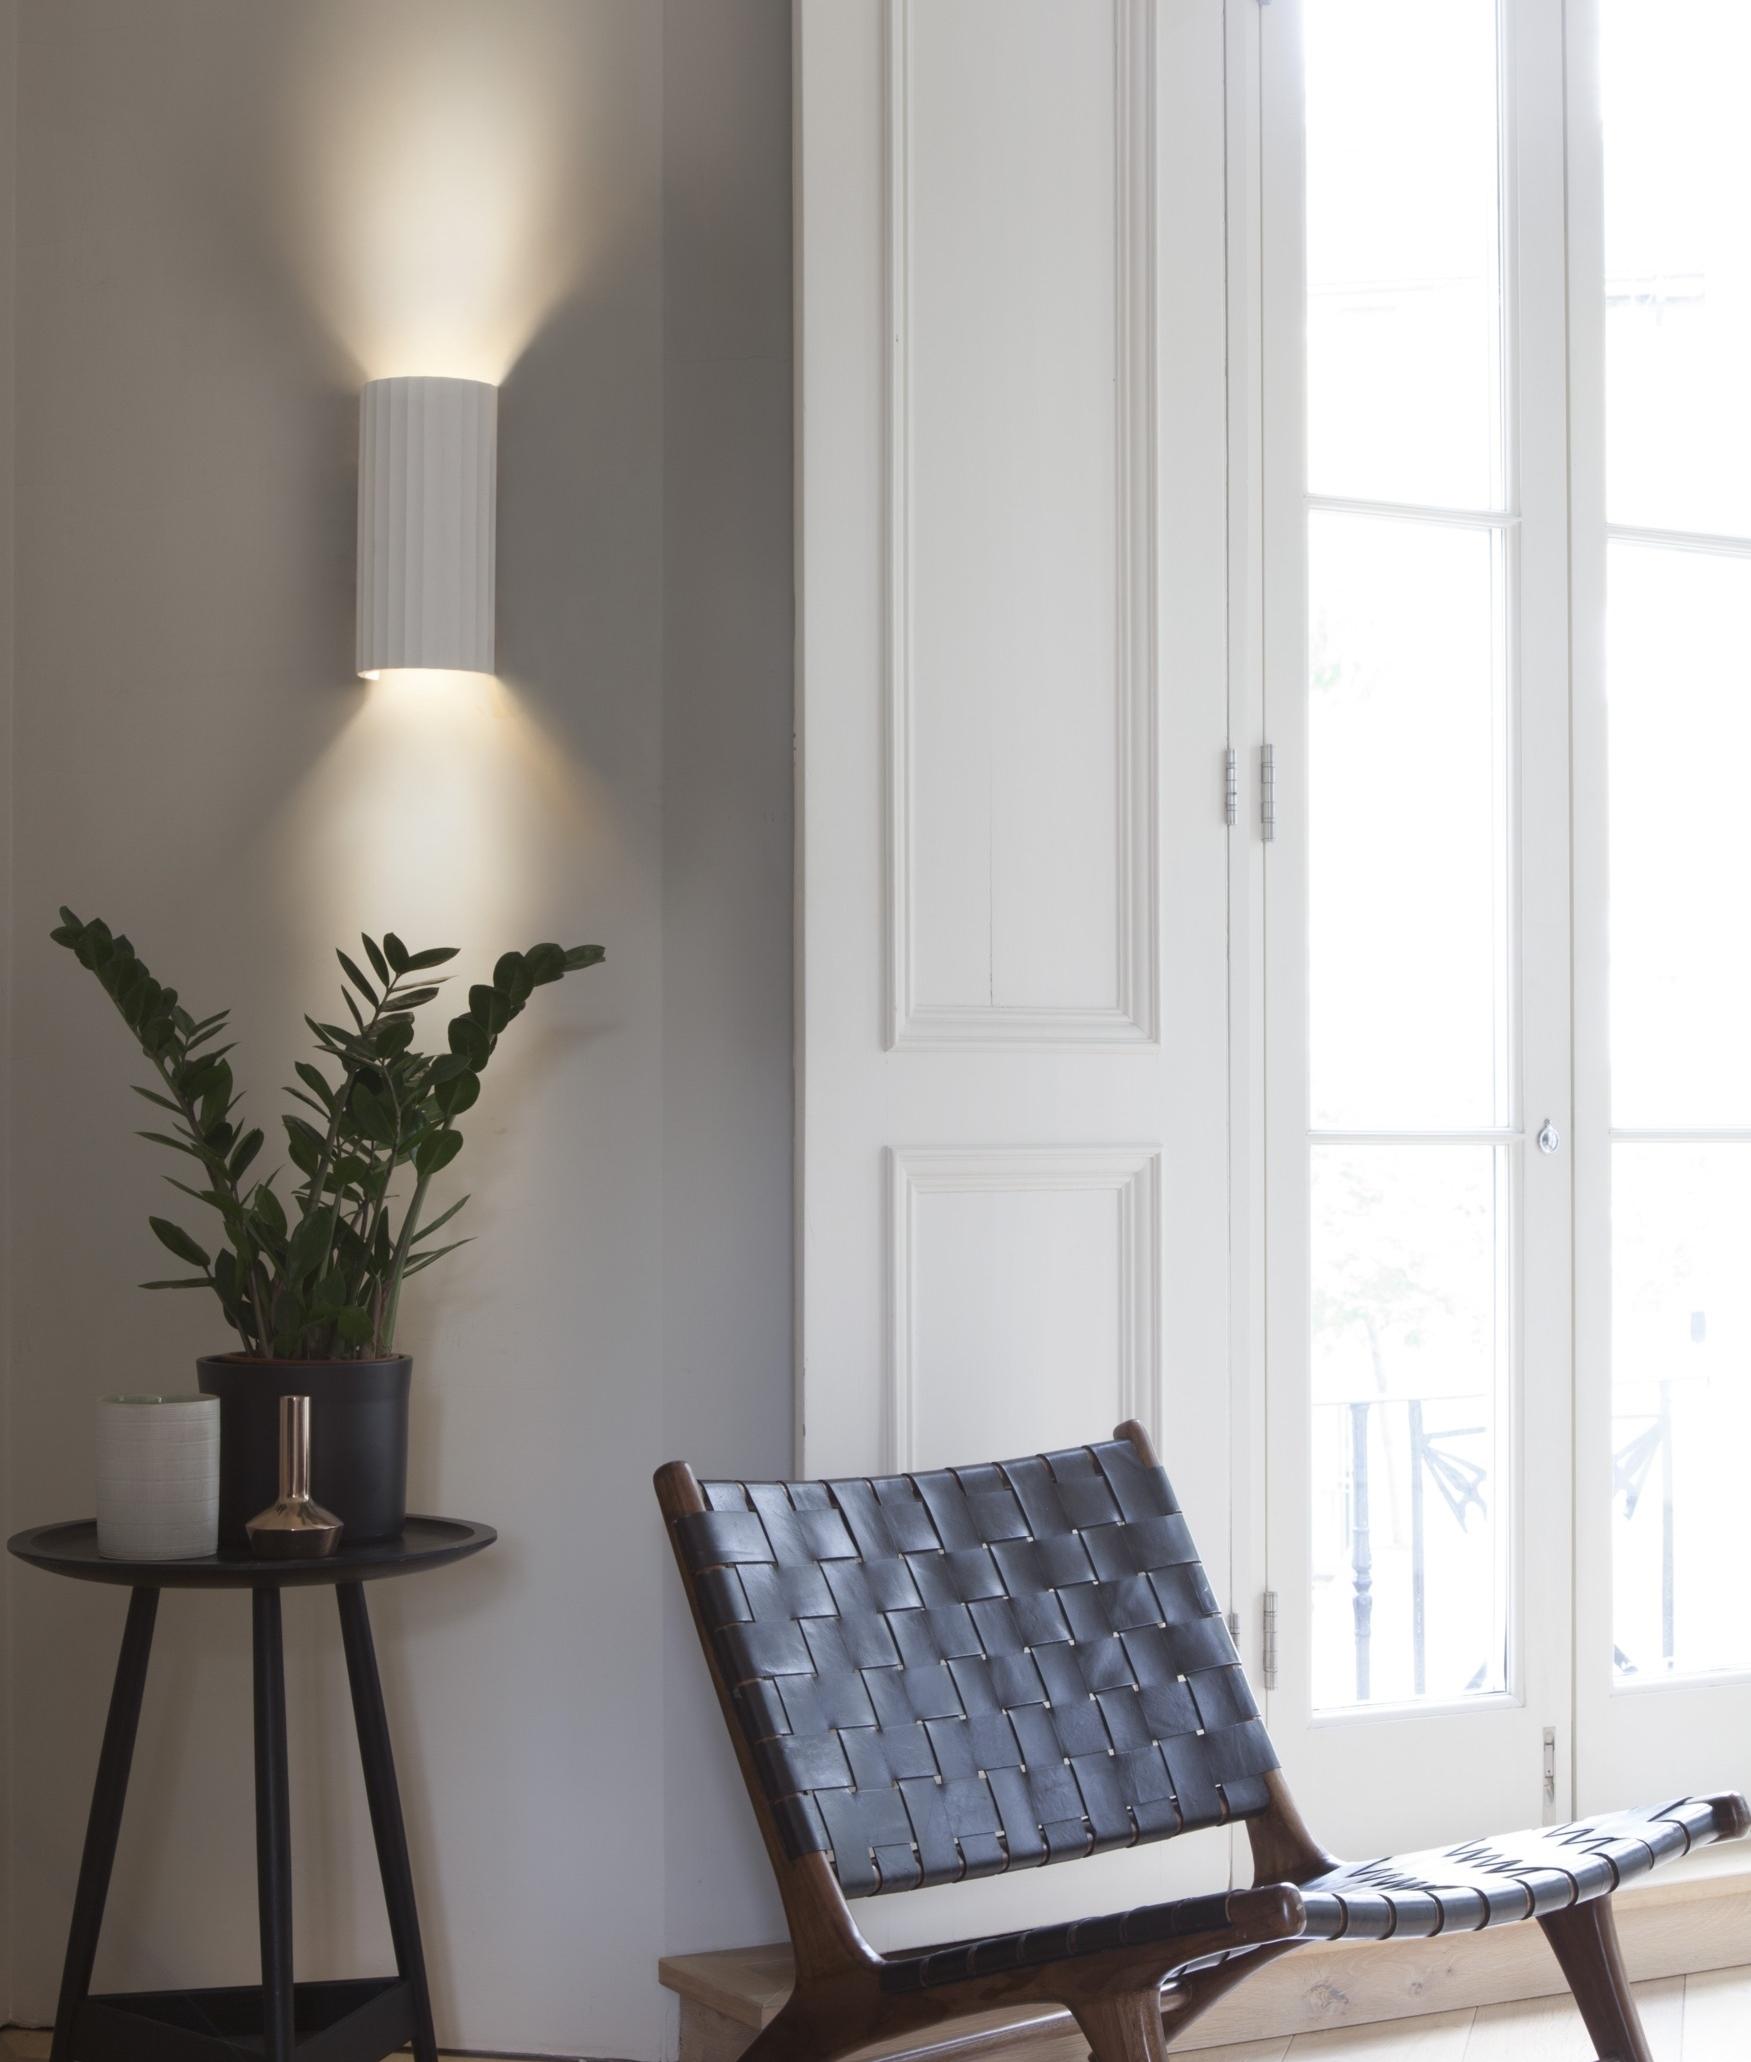 Plaster Rippled Up & Down Wall Light